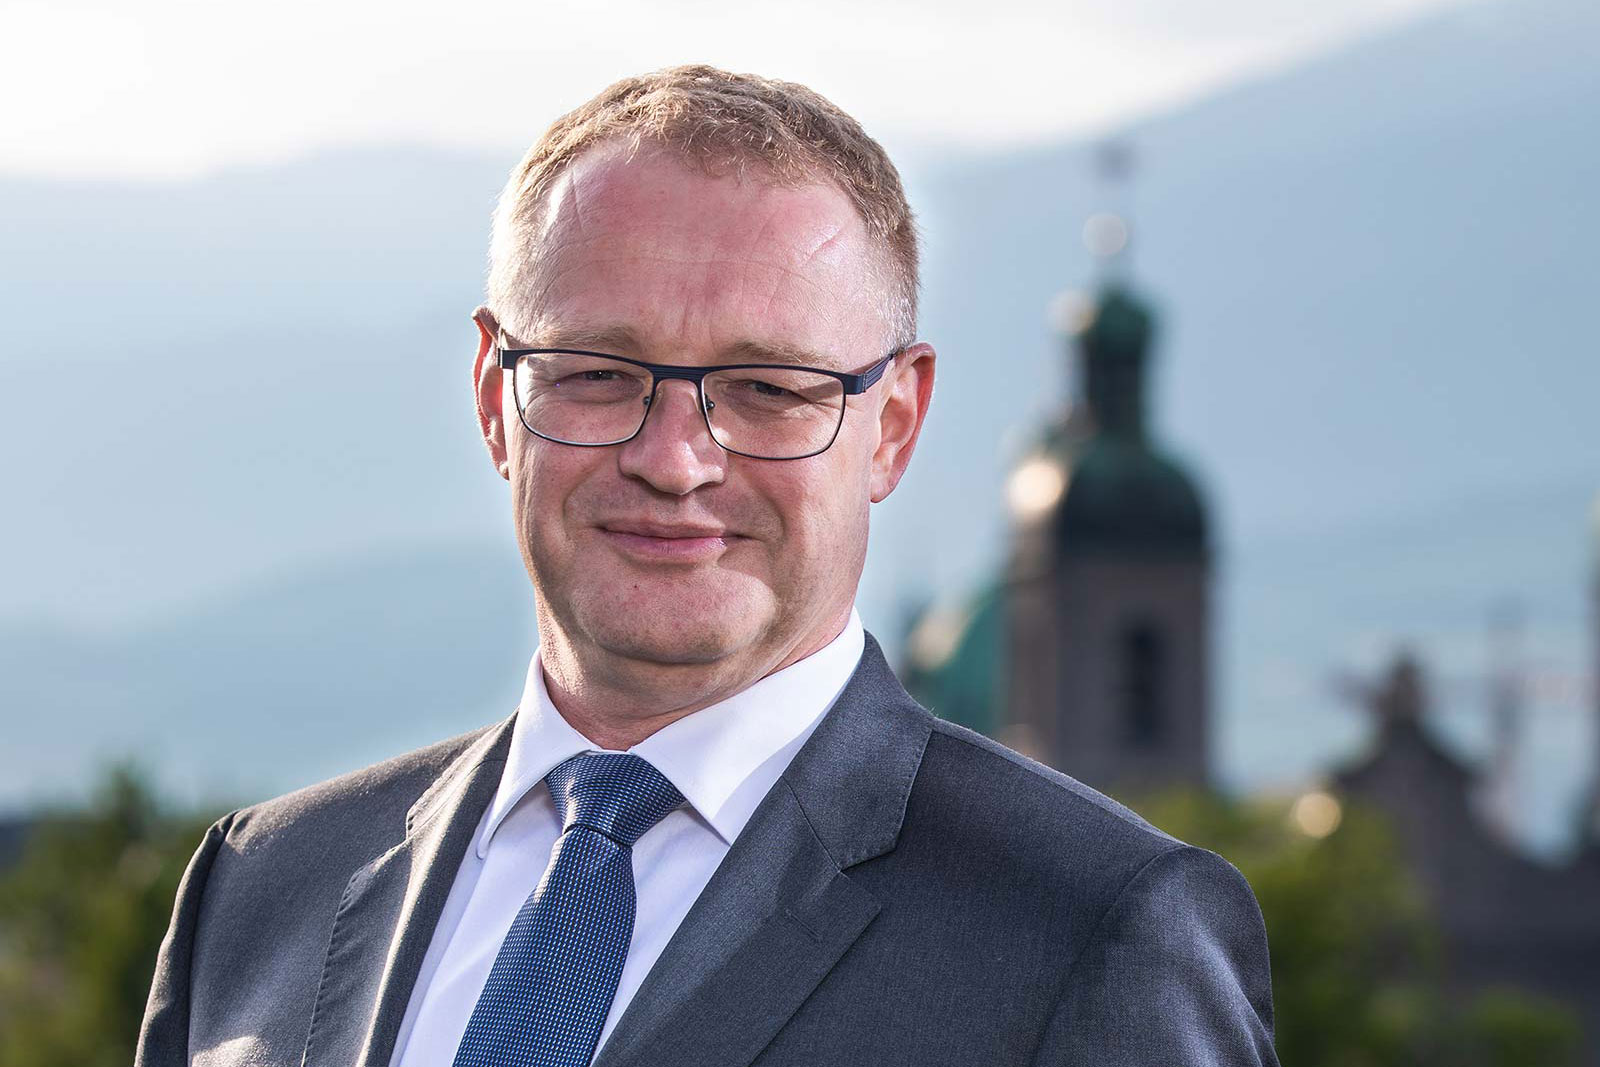 Dr. Ralf Wenzel | Fuchs Wenzel Ortner Richter Rechtsanwälte, 6020 Innsbruck